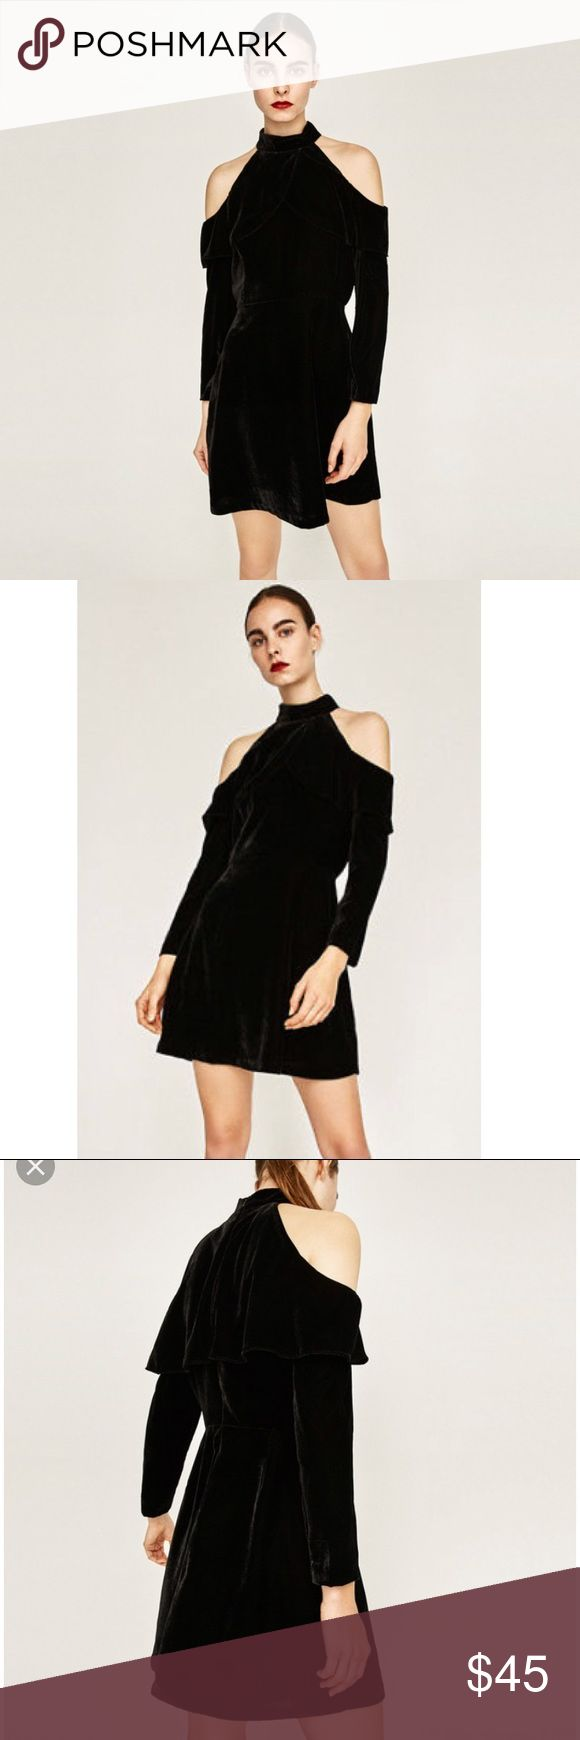 Zara black velvet dress with cutout shoulders. XS Black velvet long sleeve dress with cut out shoulders a ruffle detail. NWT Zara Dresses Long Sleeve